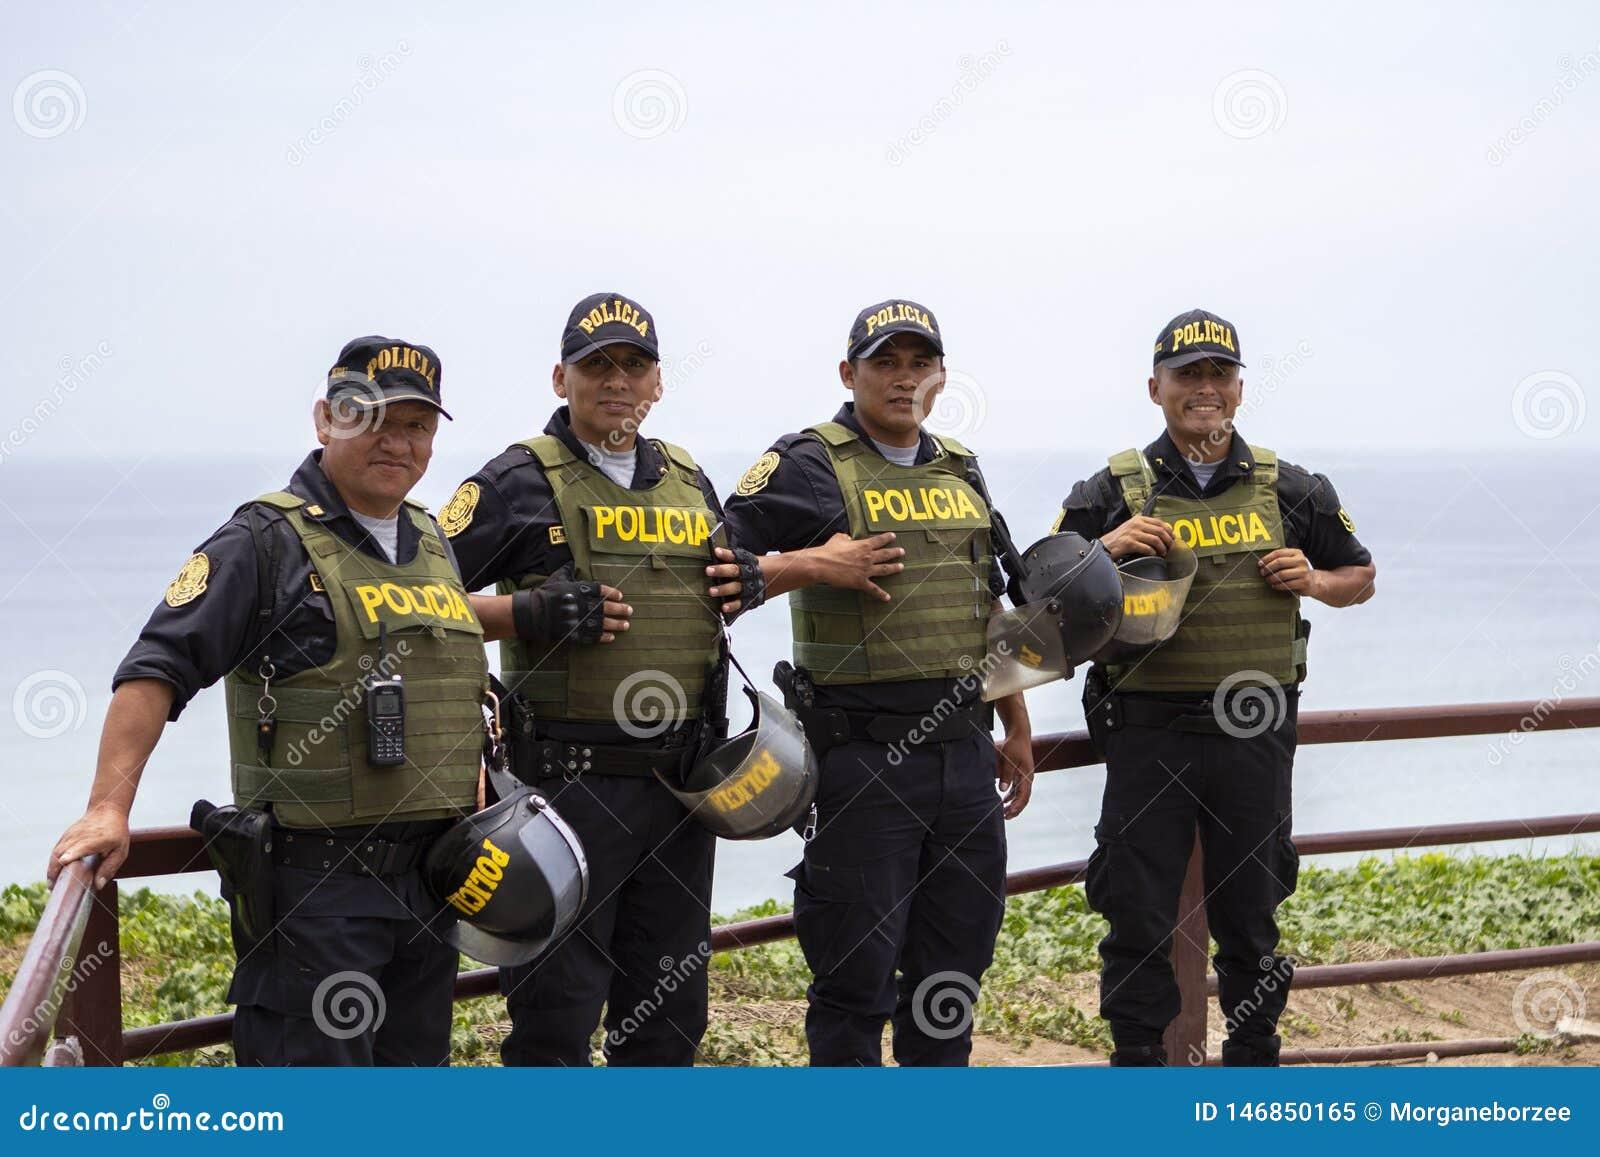 Friendly Peruvian police men smiling in Miraflores